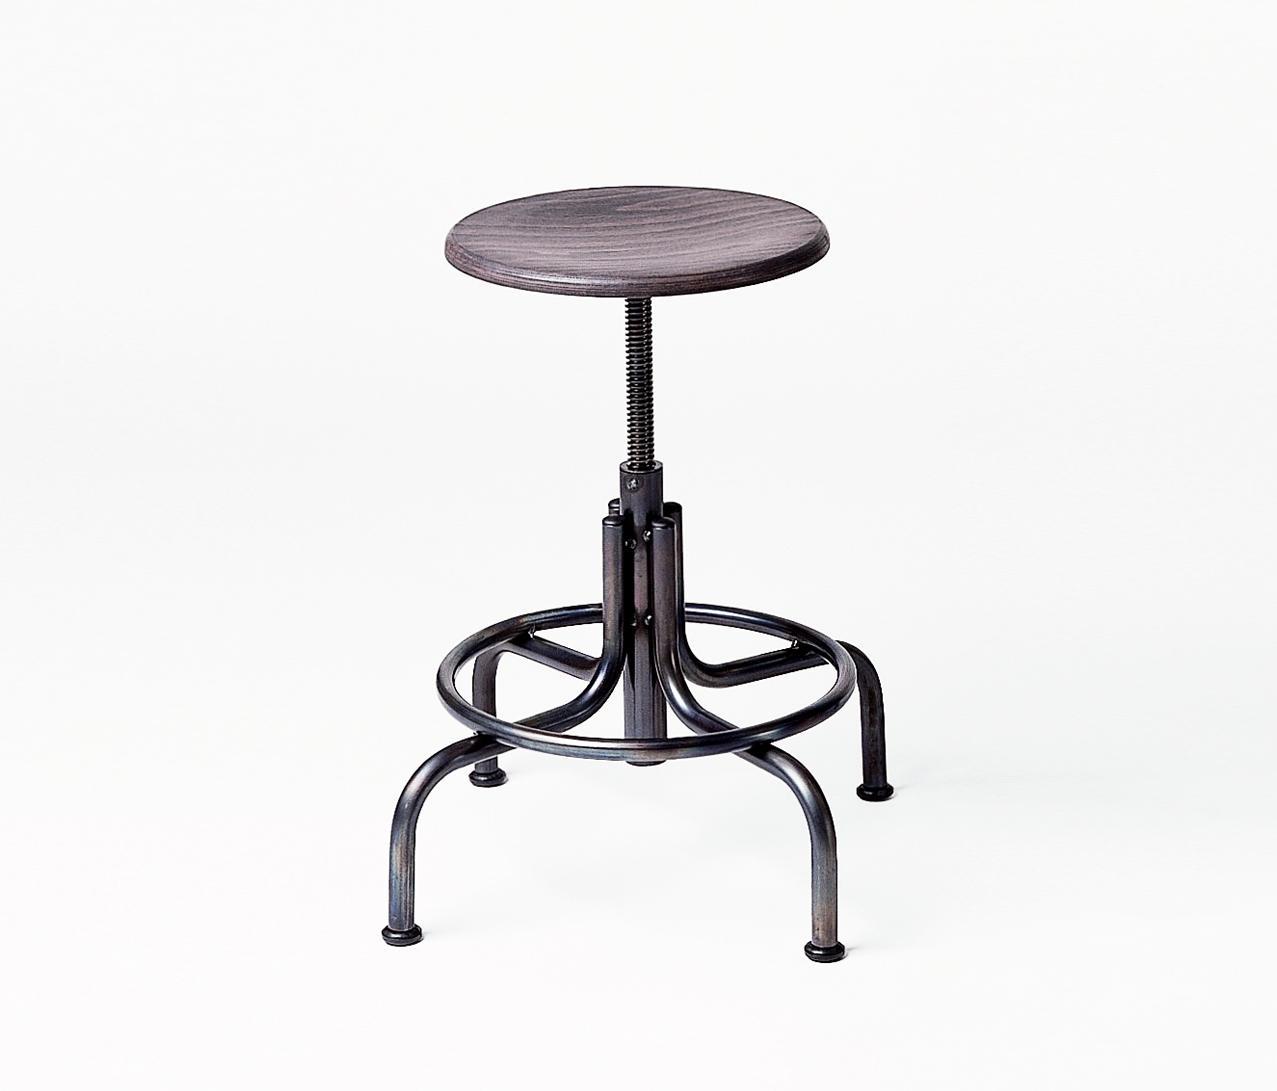 industrie stool tabourets de bureau de lambert architonic. Black Bedroom Furniture Sets. Home Design Ideas